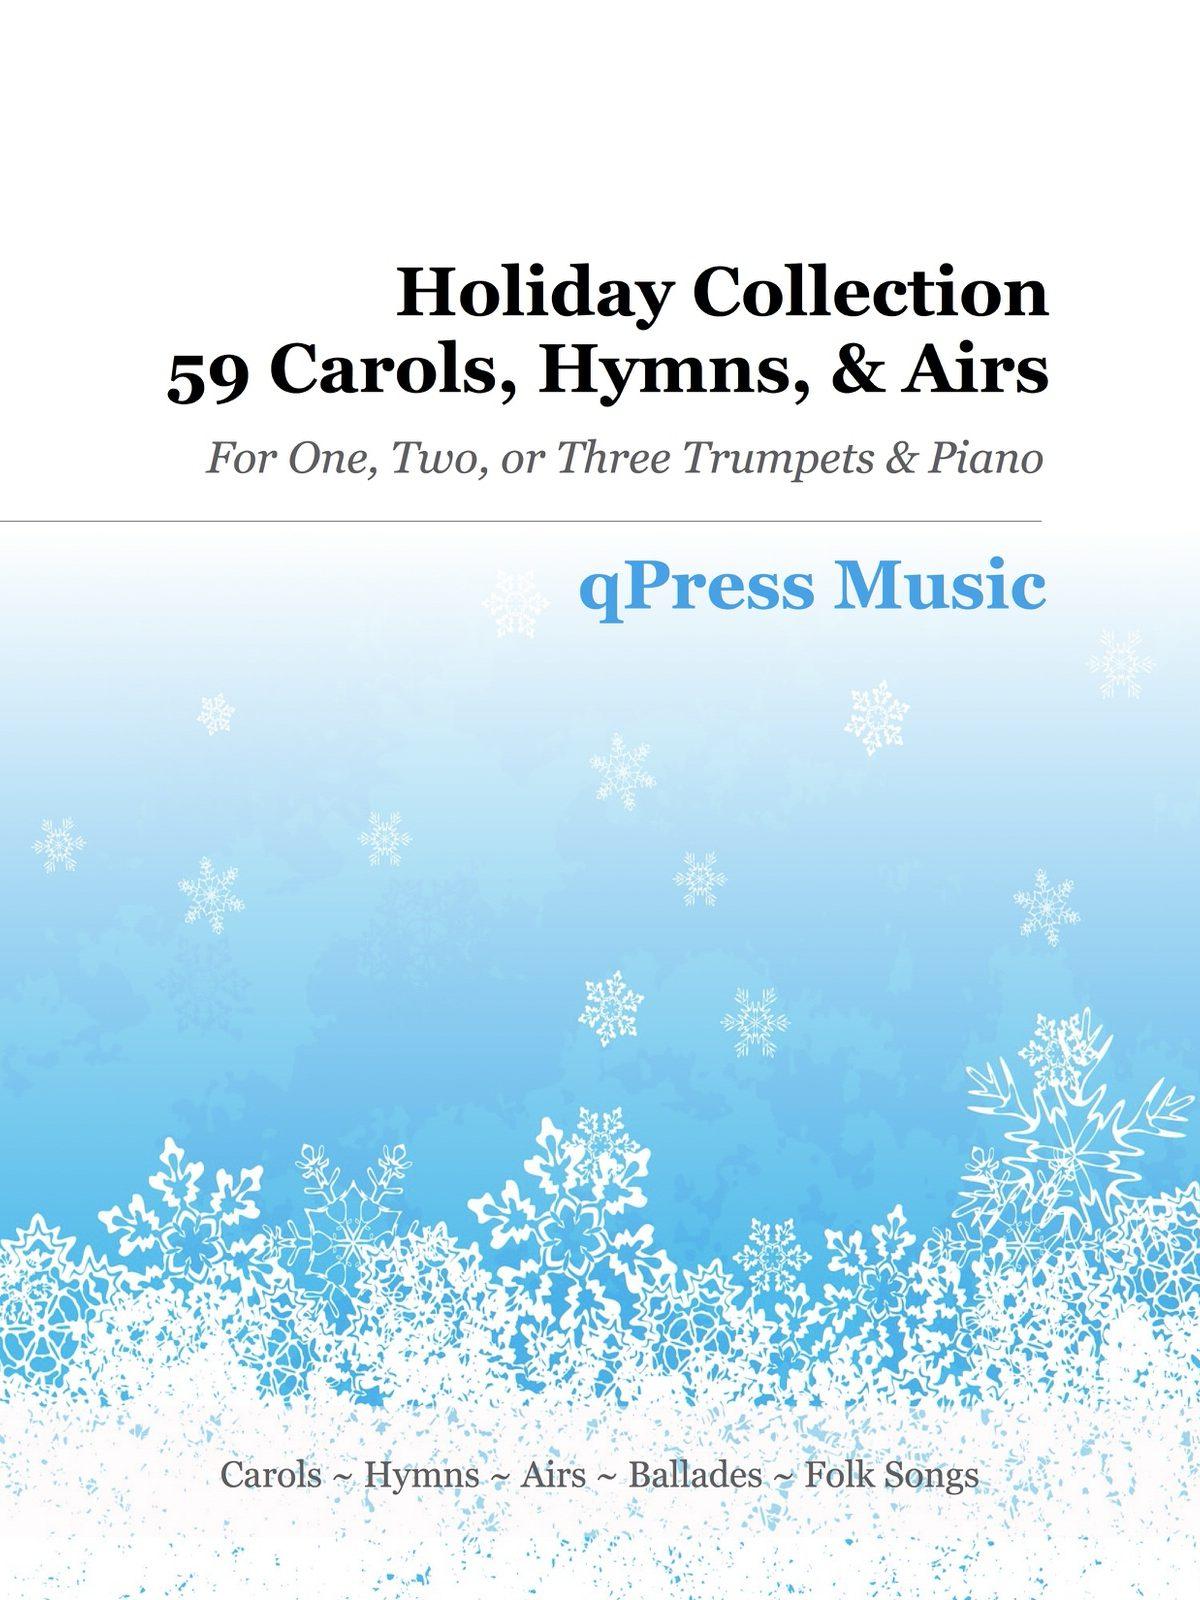 Various, Holiday Collection (59 Carols, Hymns, and Airs)-p001